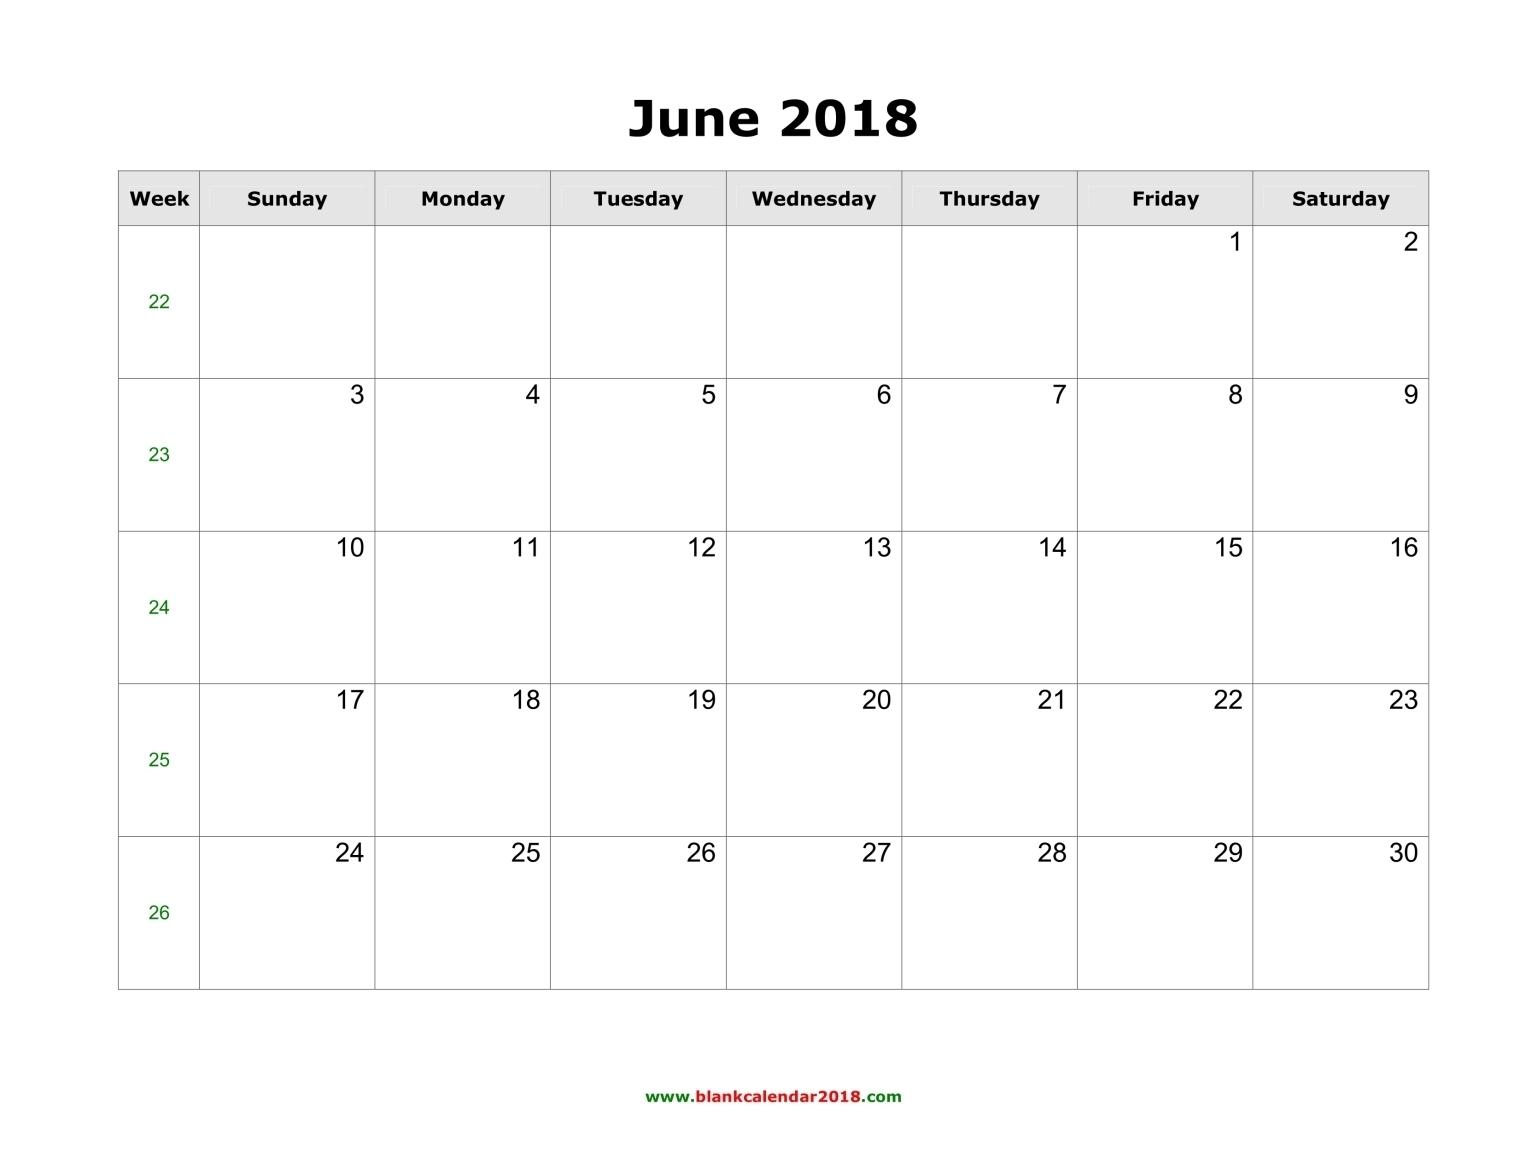 June 2018 Calendar Notes